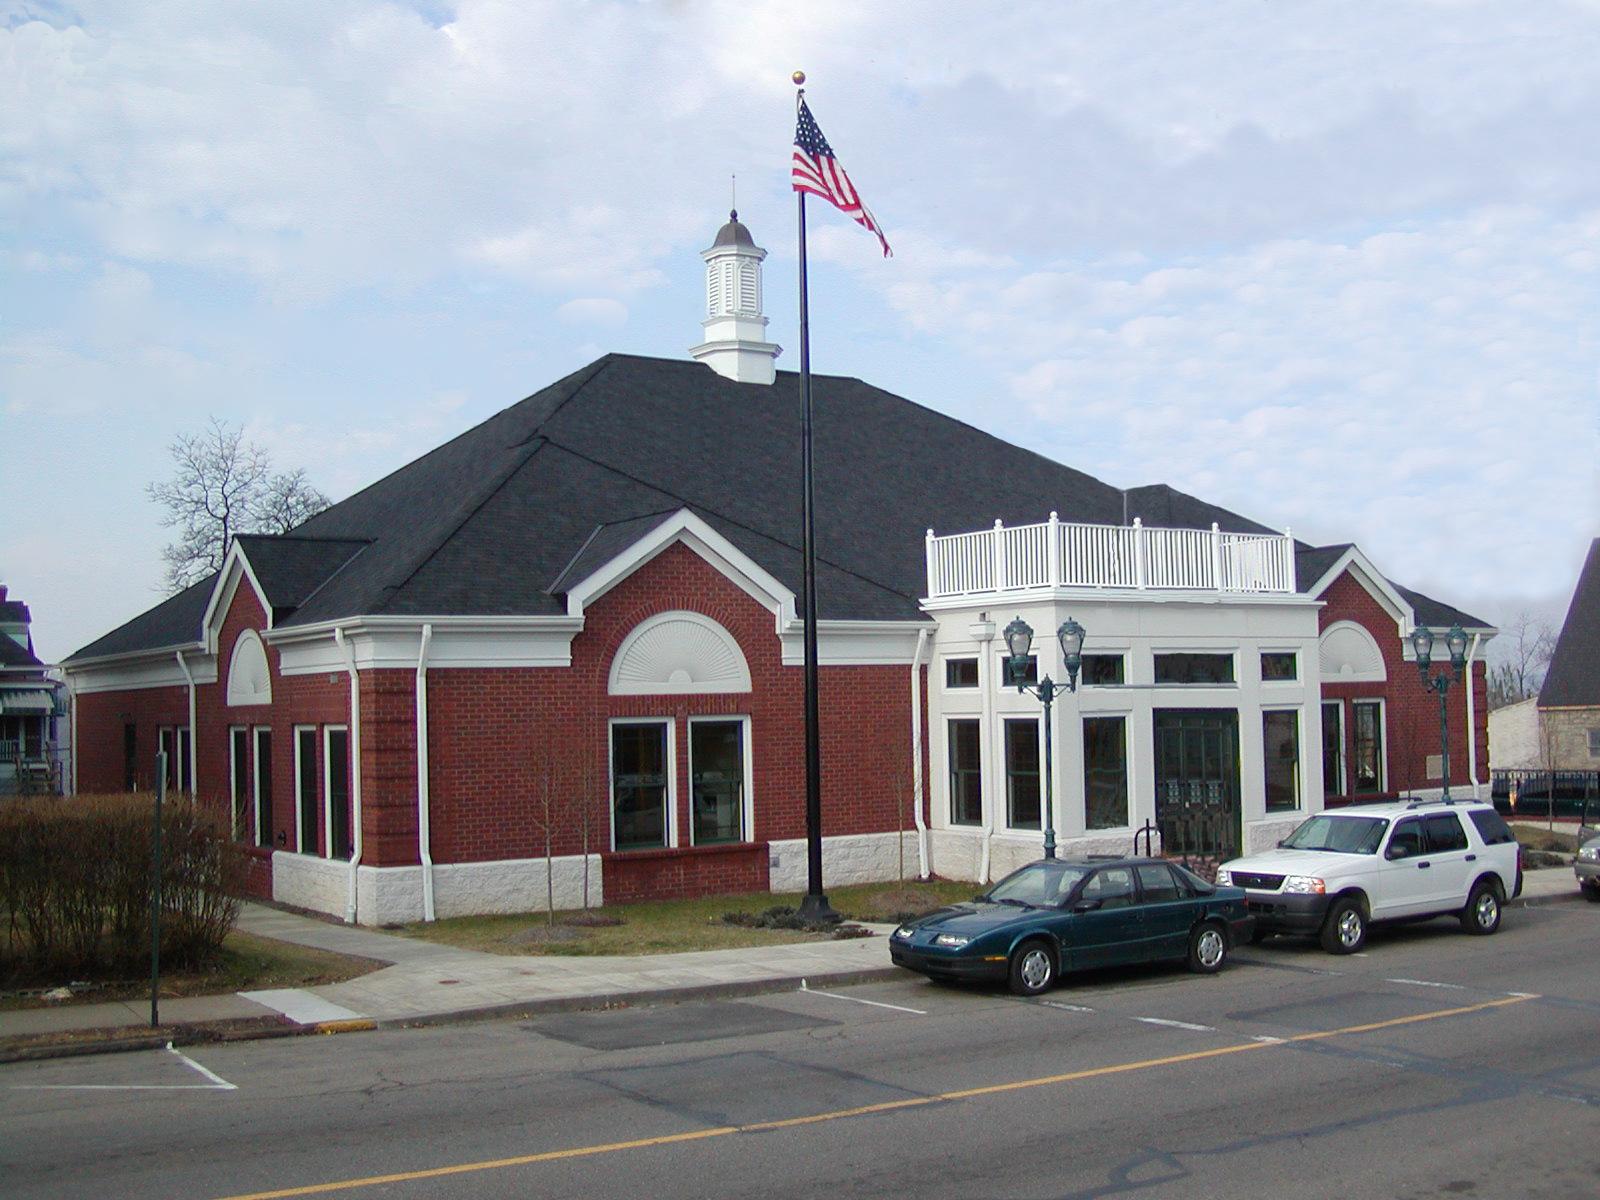 Avalon Borough Building, Avalon, PA